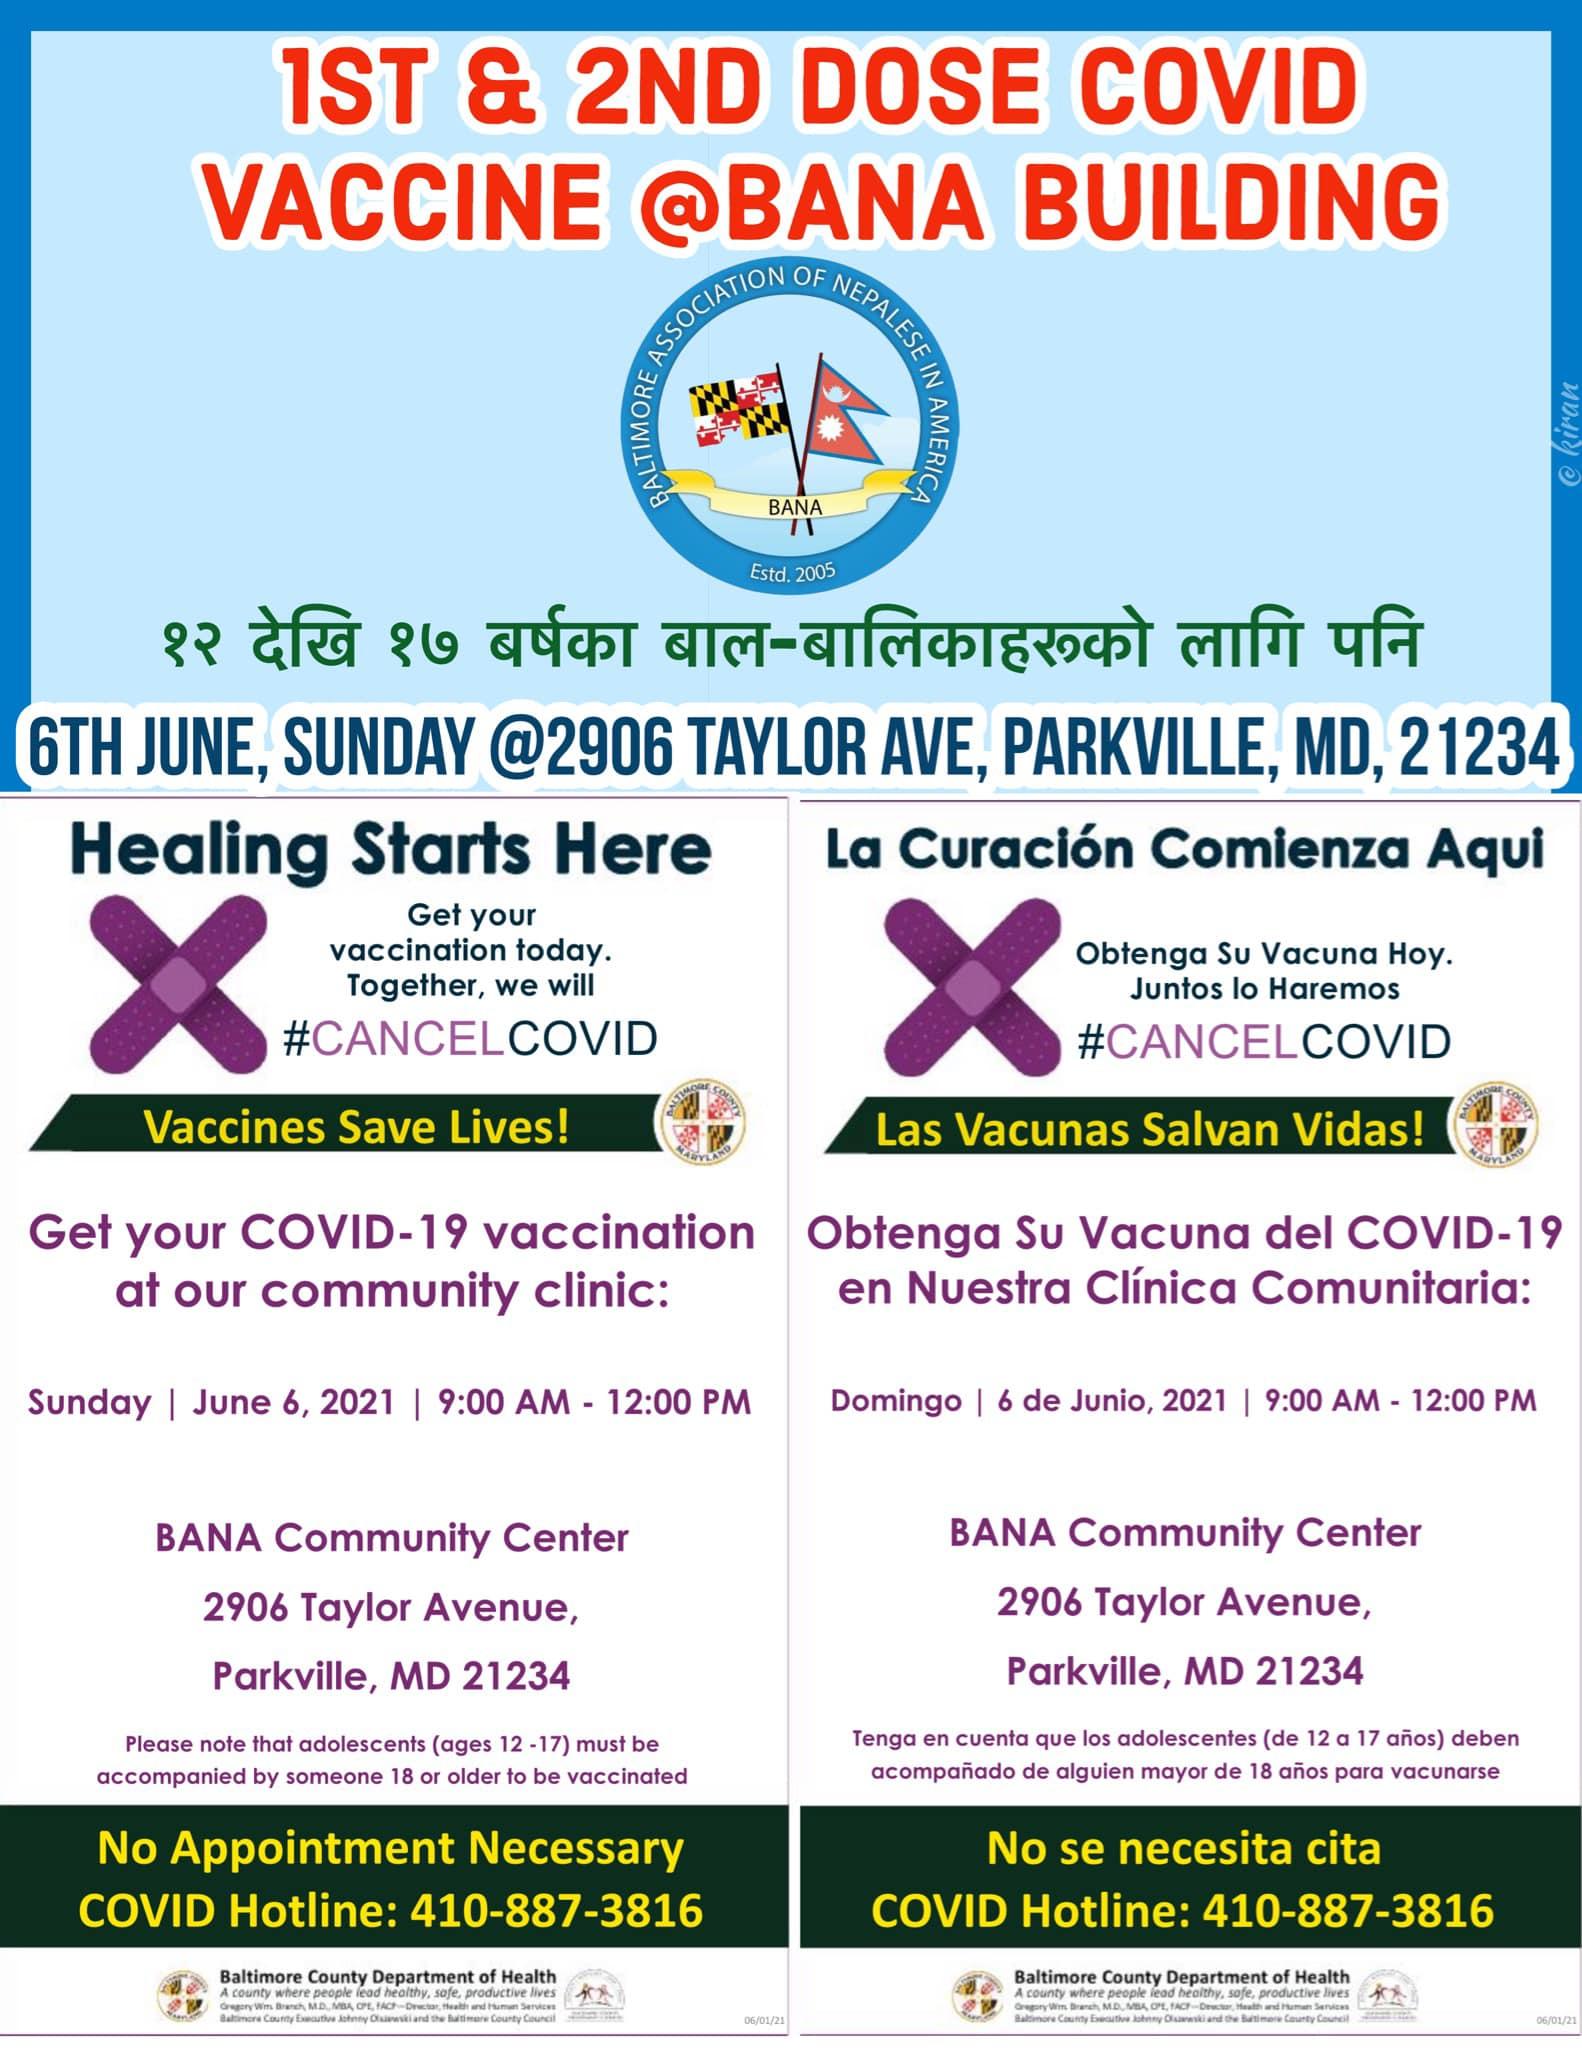 1st & 2nd Dose Covid Vaccine